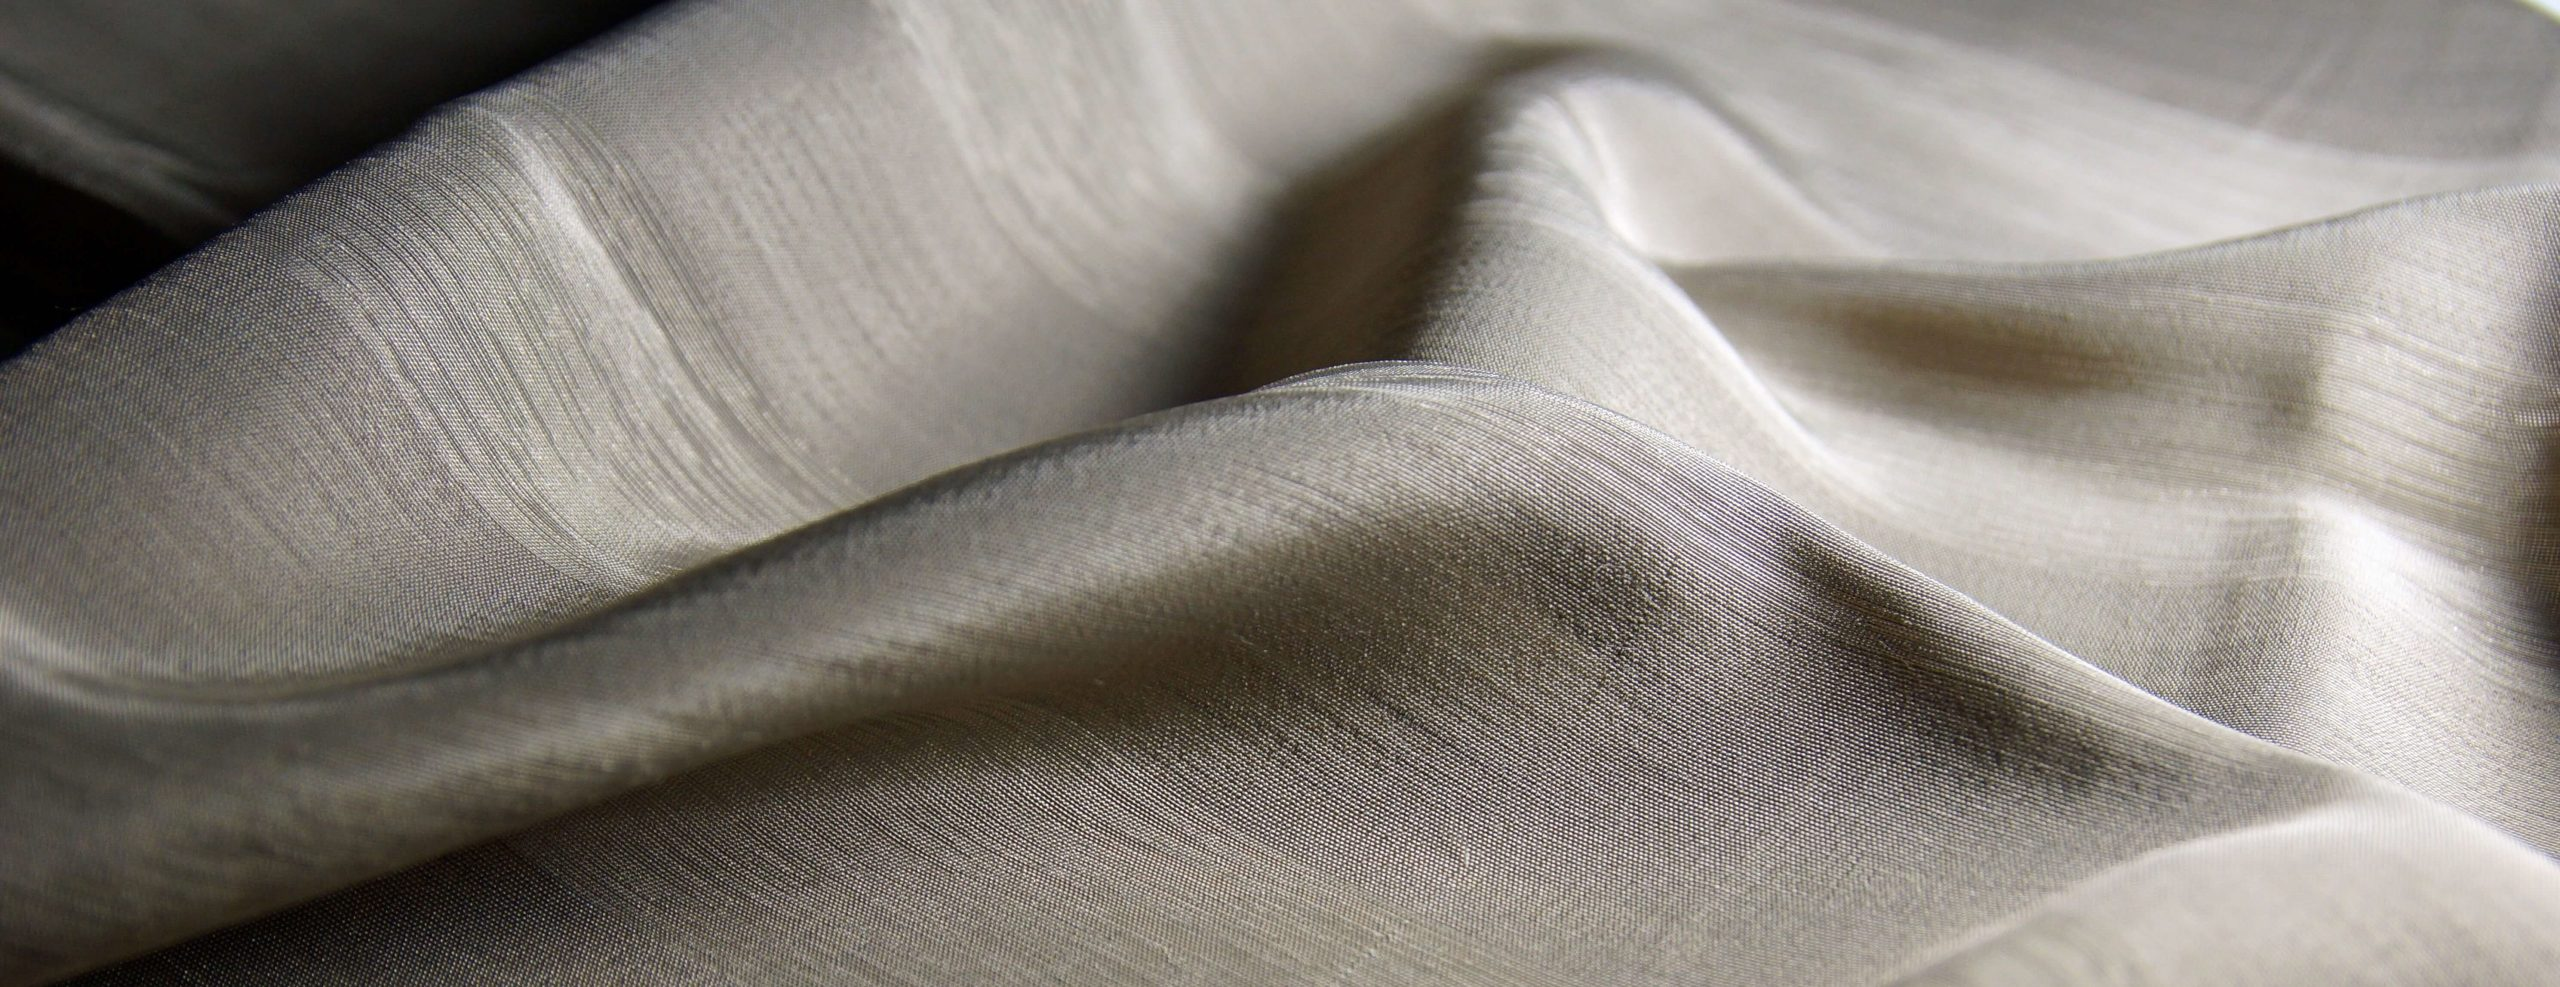 métier textile Tissage Robert Blanc